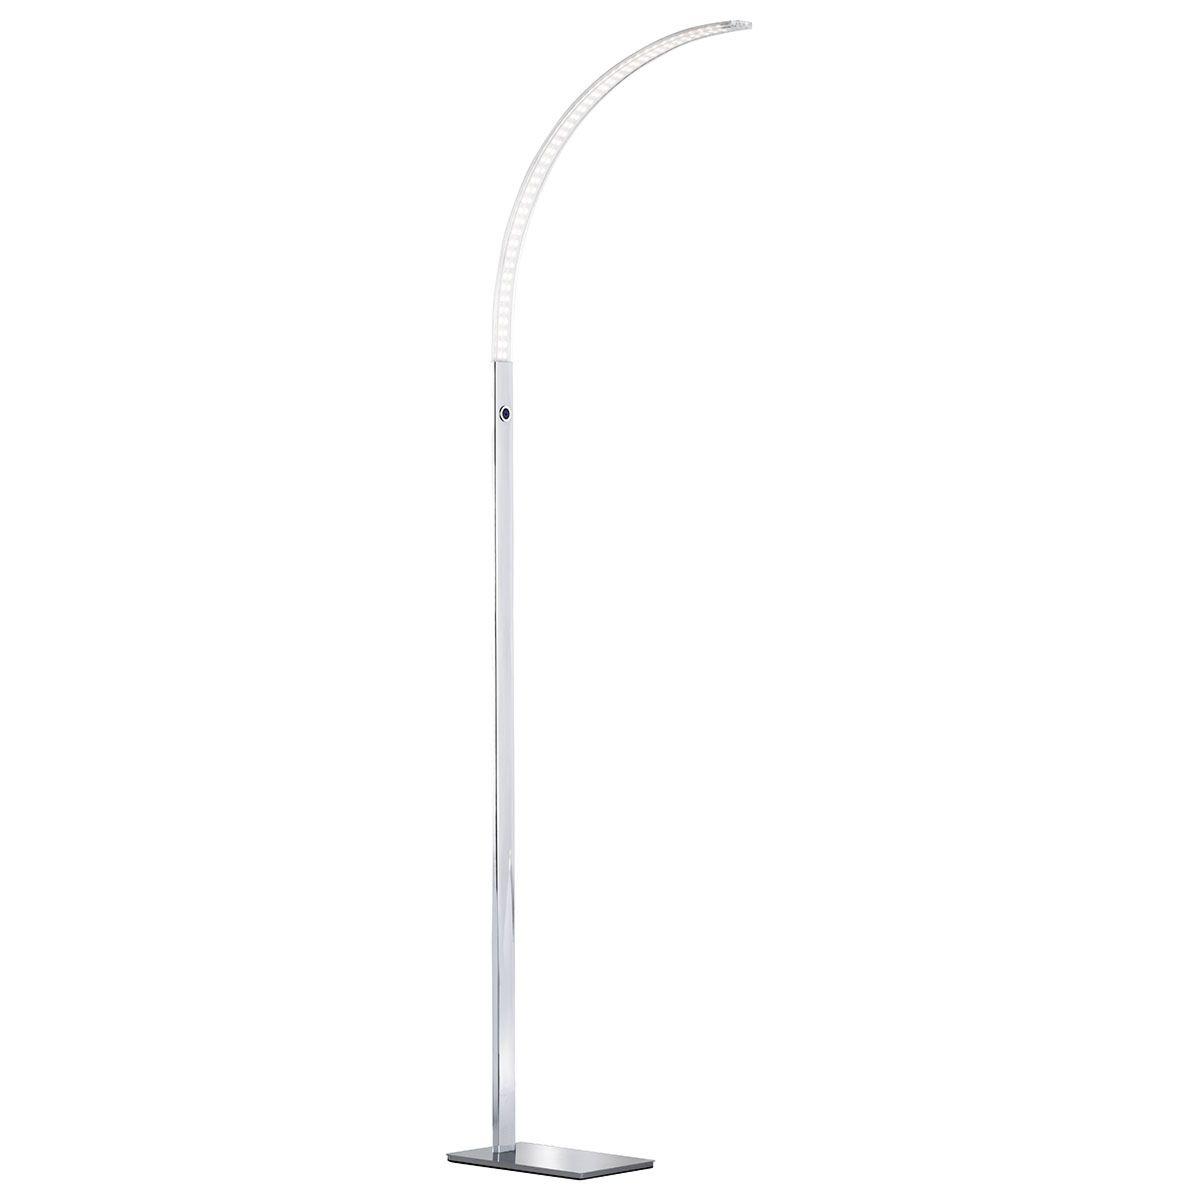 Wofi Luz Floor Lamp - Chrome - LED (16.8W)